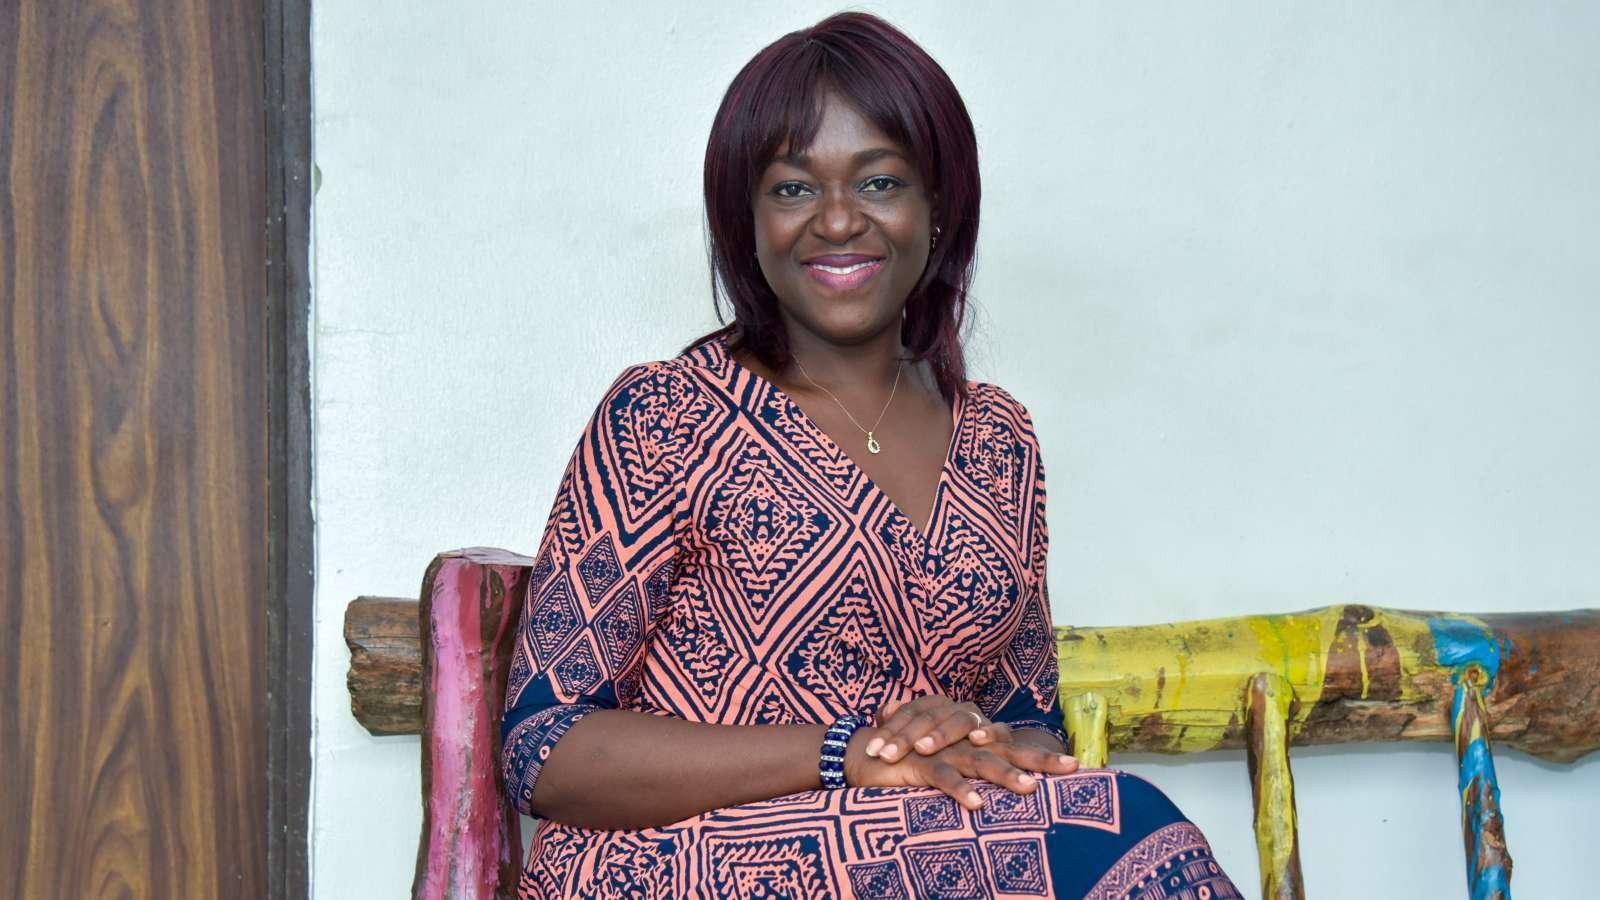 Royaume-Uni sites de rencontres nigérianes